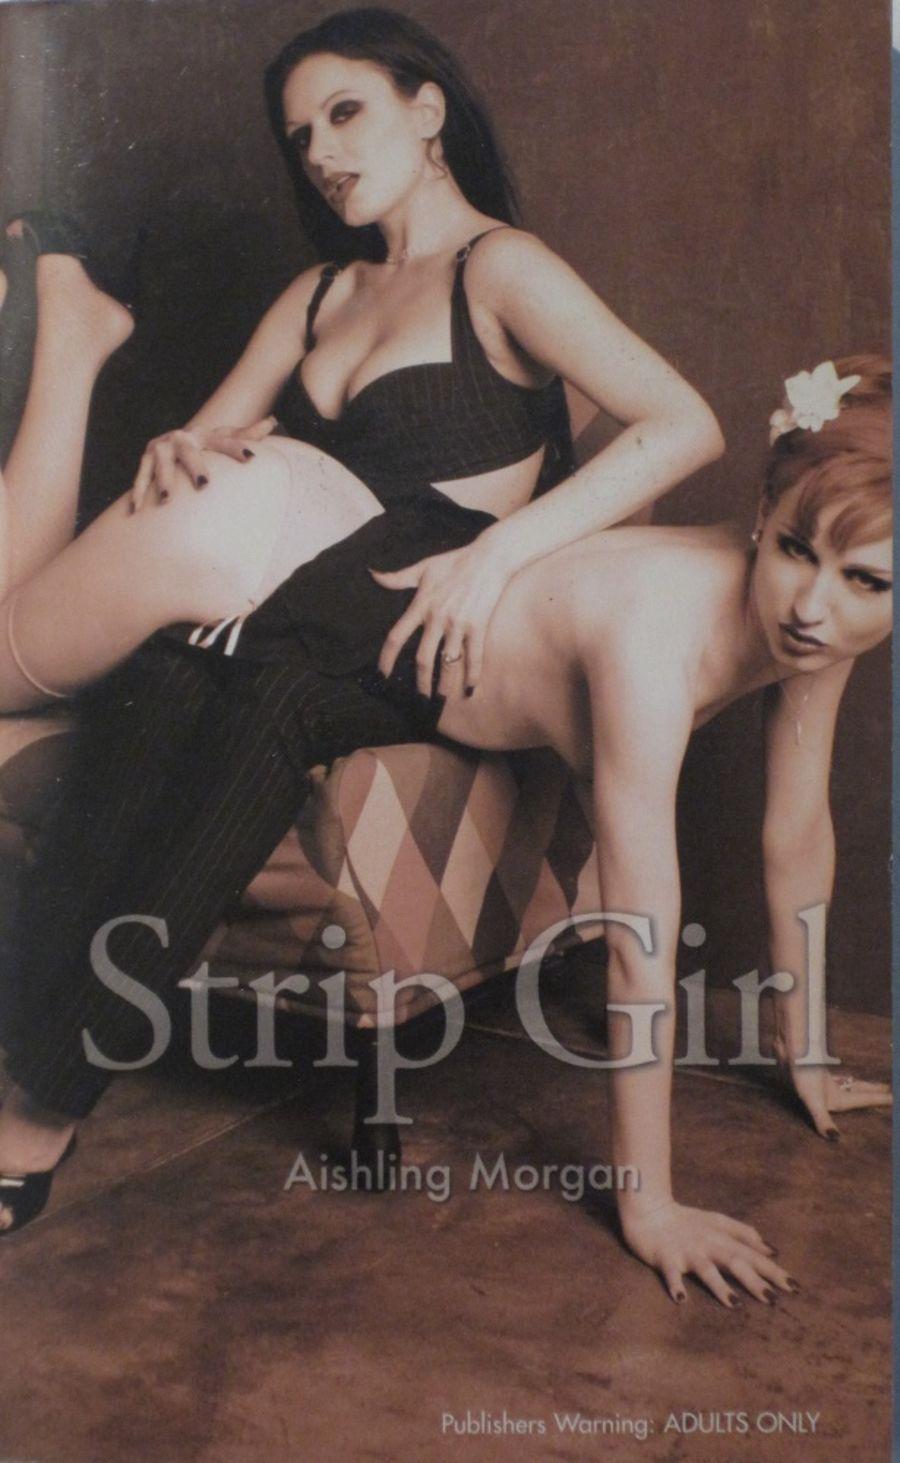 STRIP GIRL.  2006 EROTIC FICTION PAPERBACK BOOK.